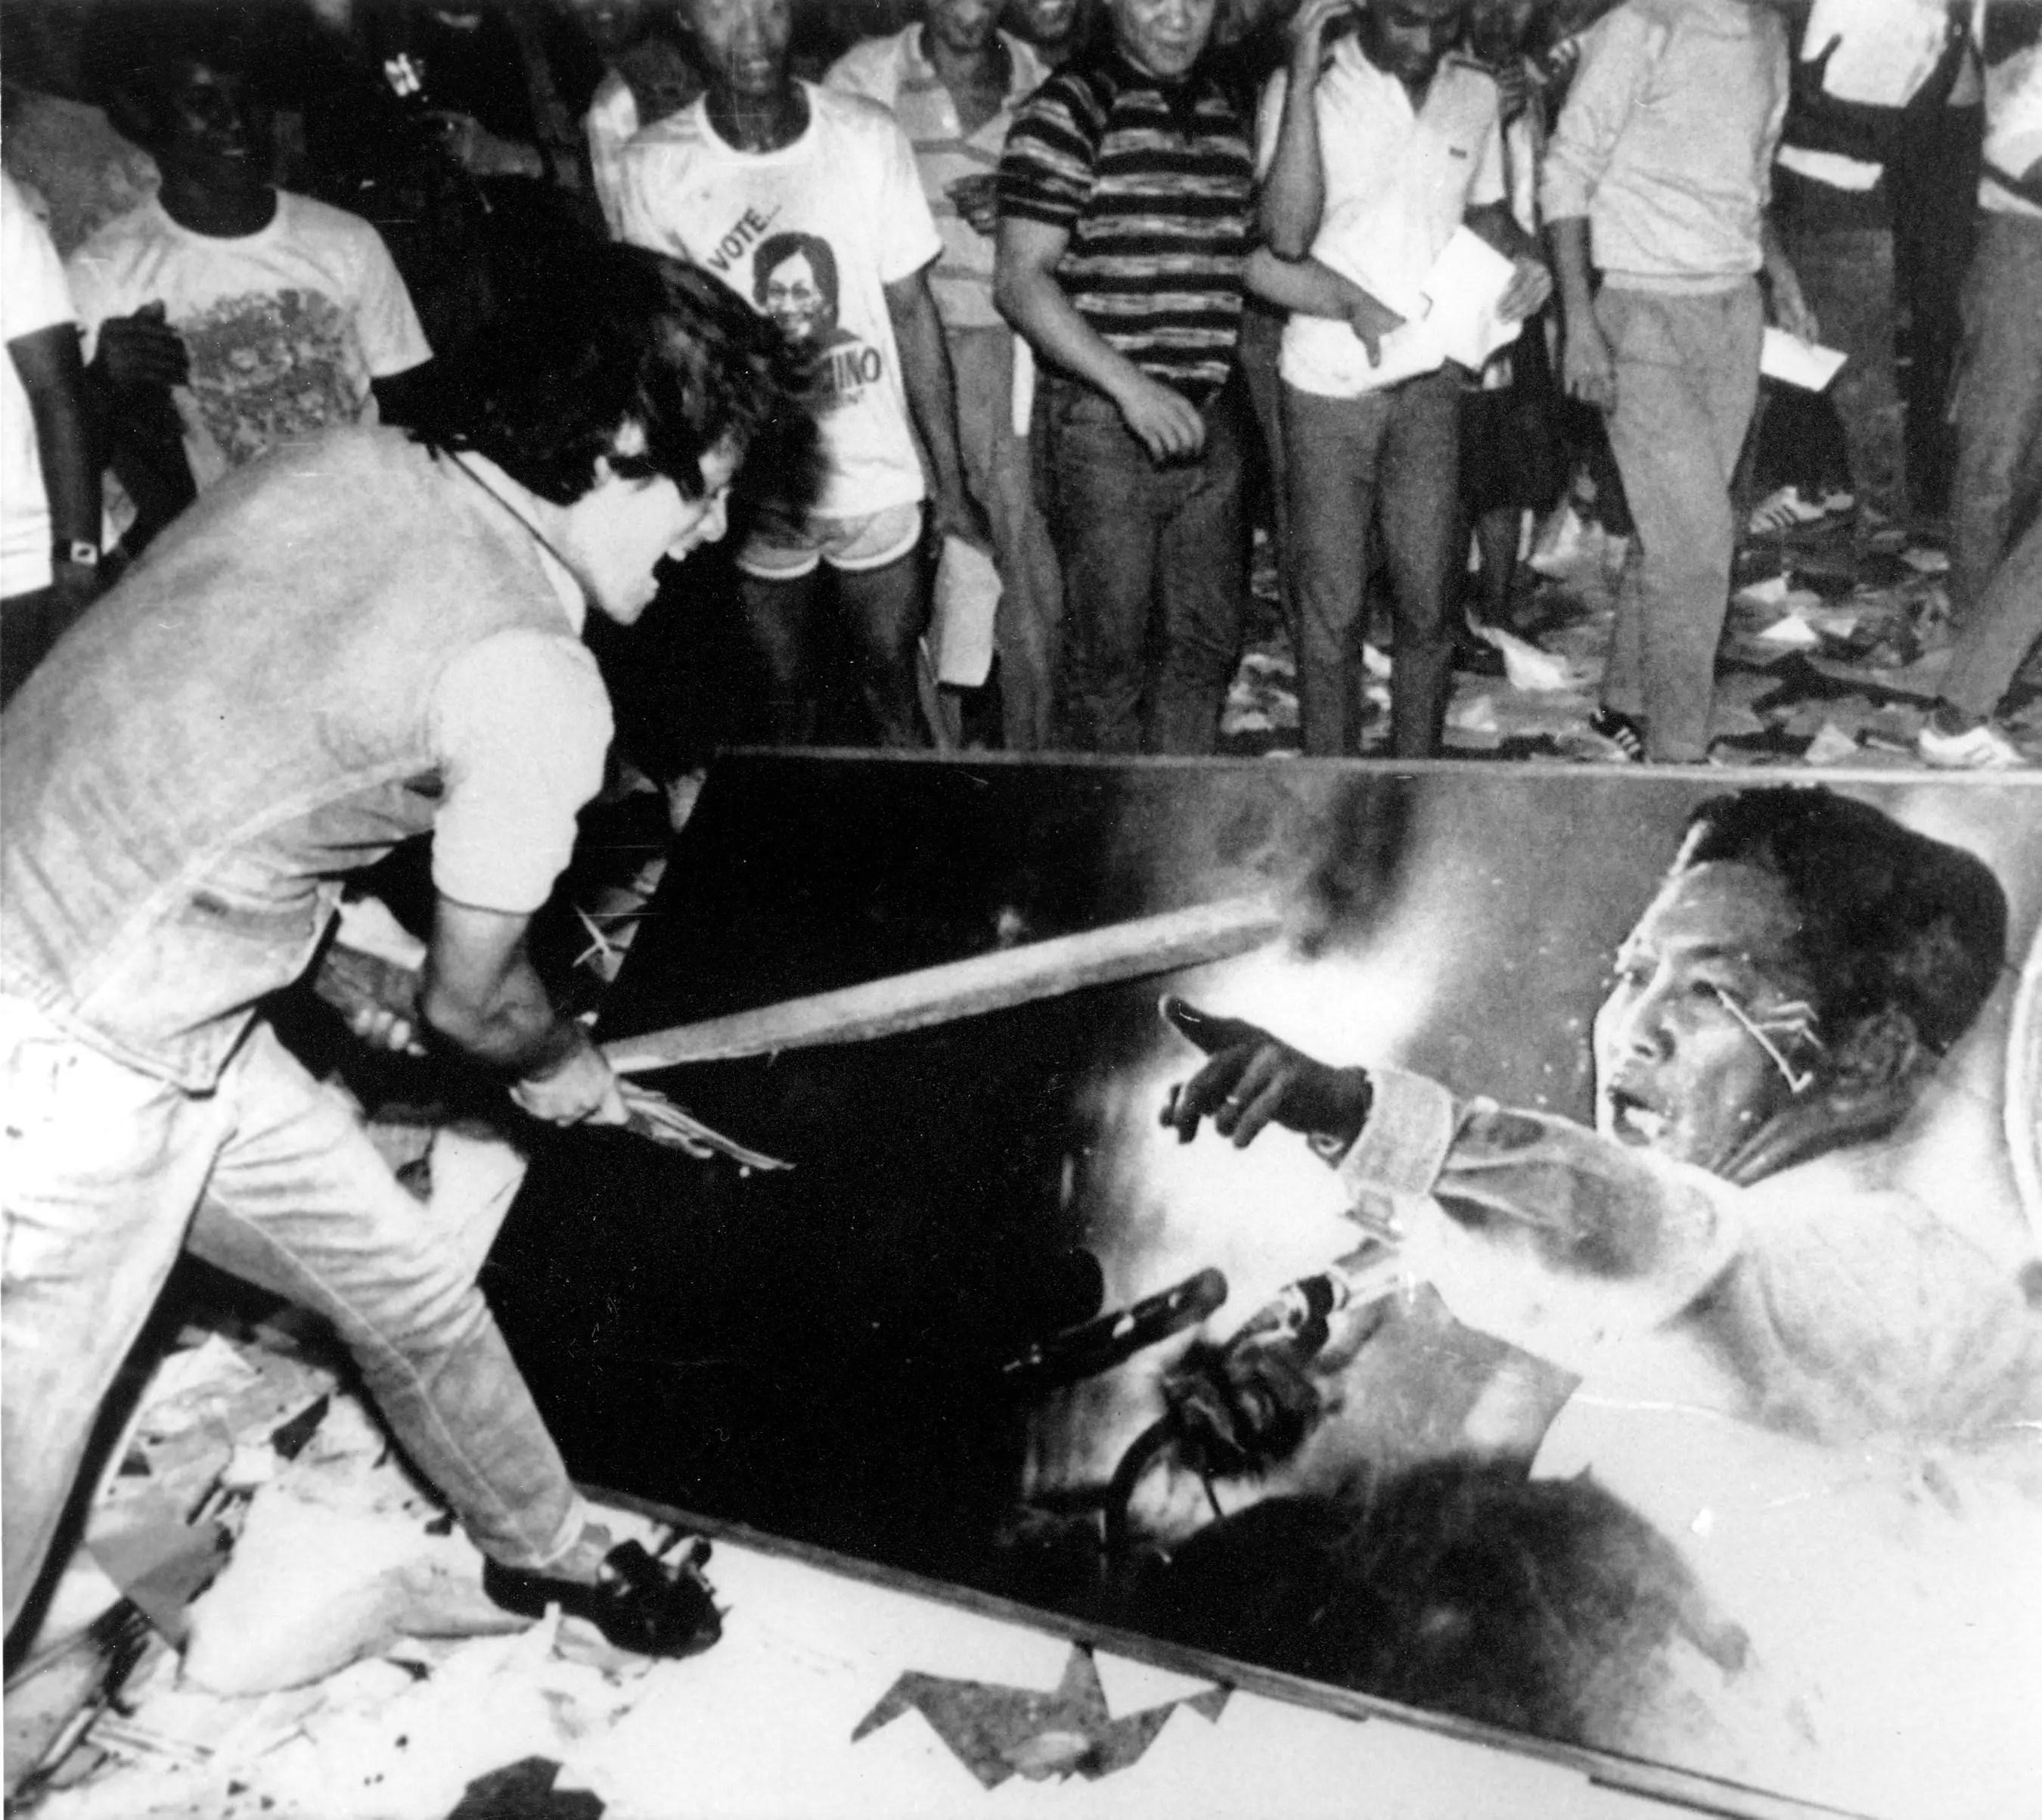 Philippines People Power Ferdinand Marcos dictator riot revolution